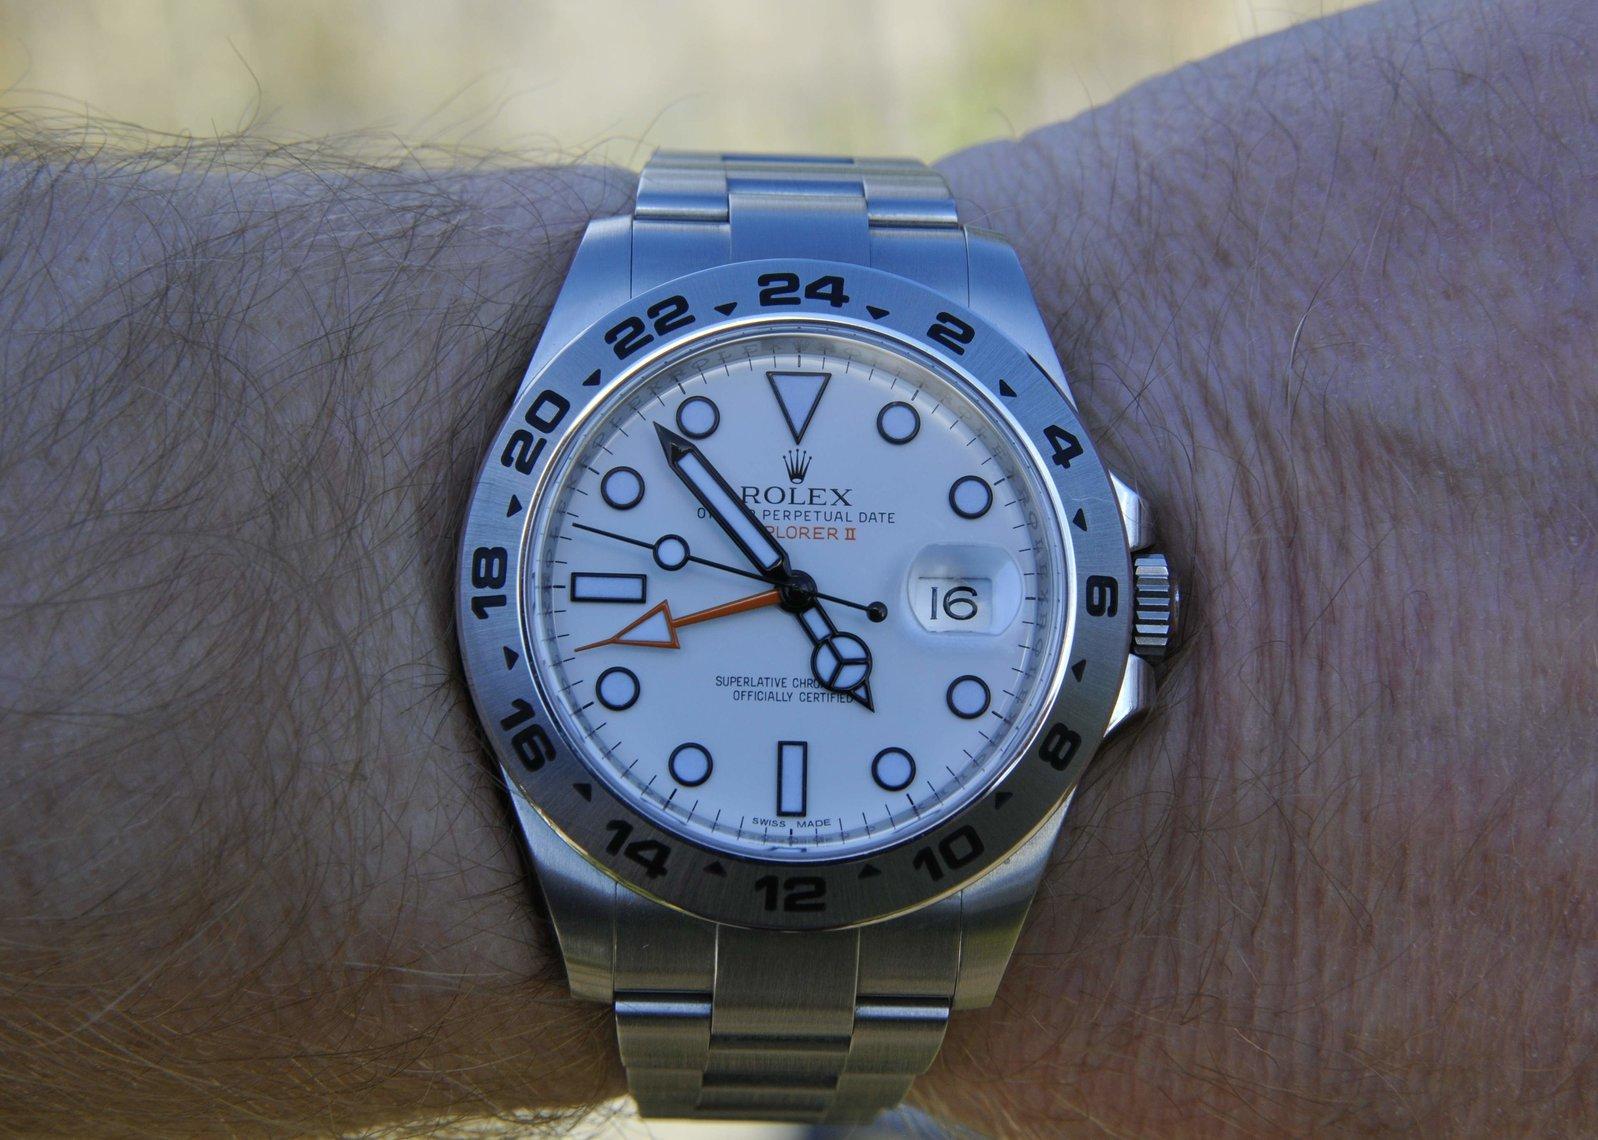 Rolex E 2015-04-16 (skugga).jpg